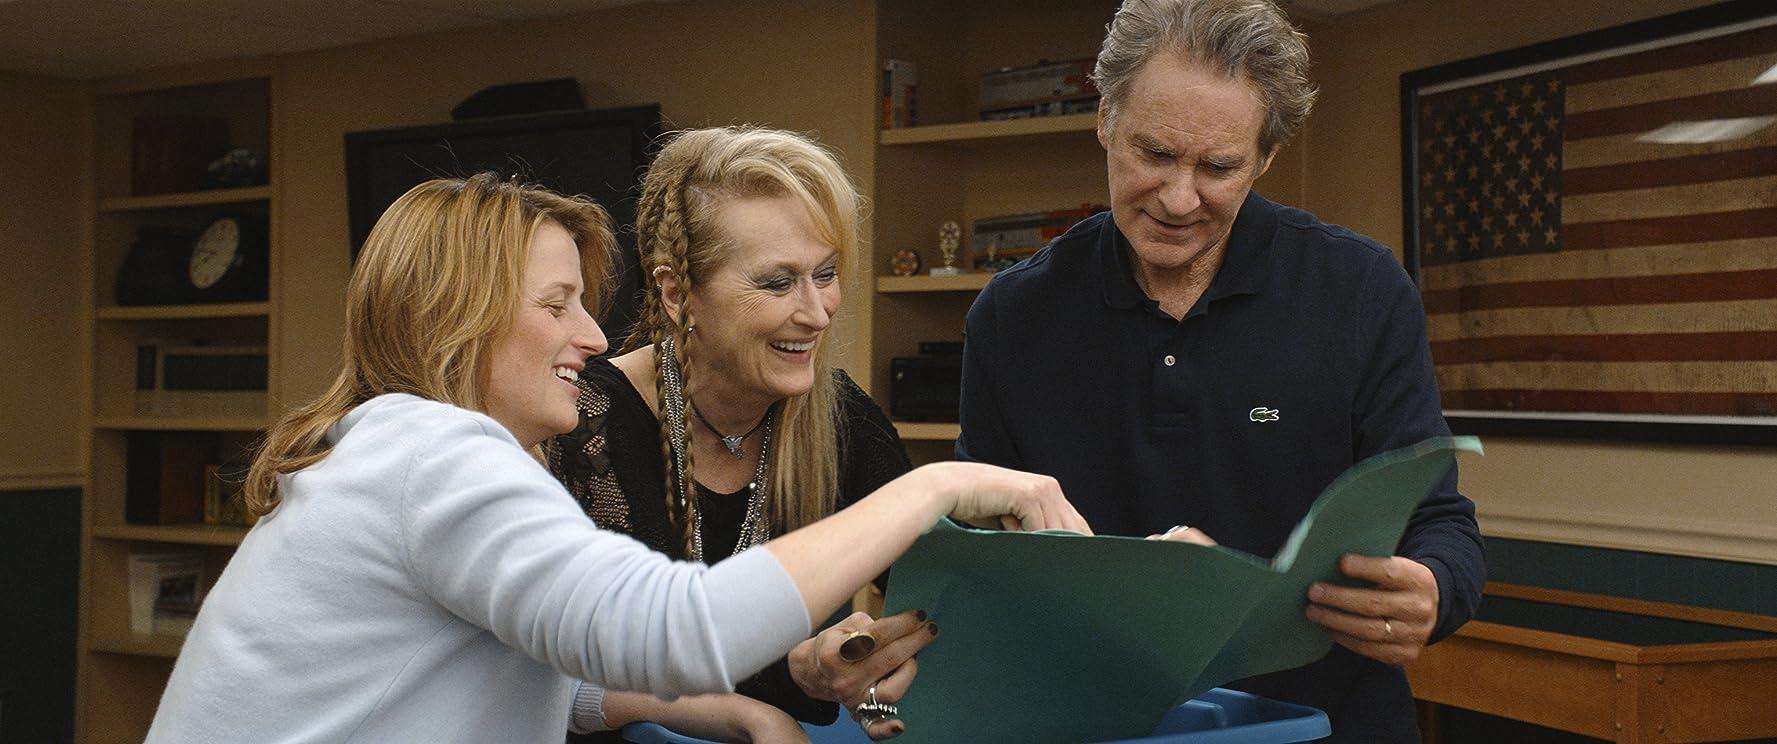 Kevin Kline, Meryl Streep, and Mamie Gummer in Ricki and the Flash (2015)